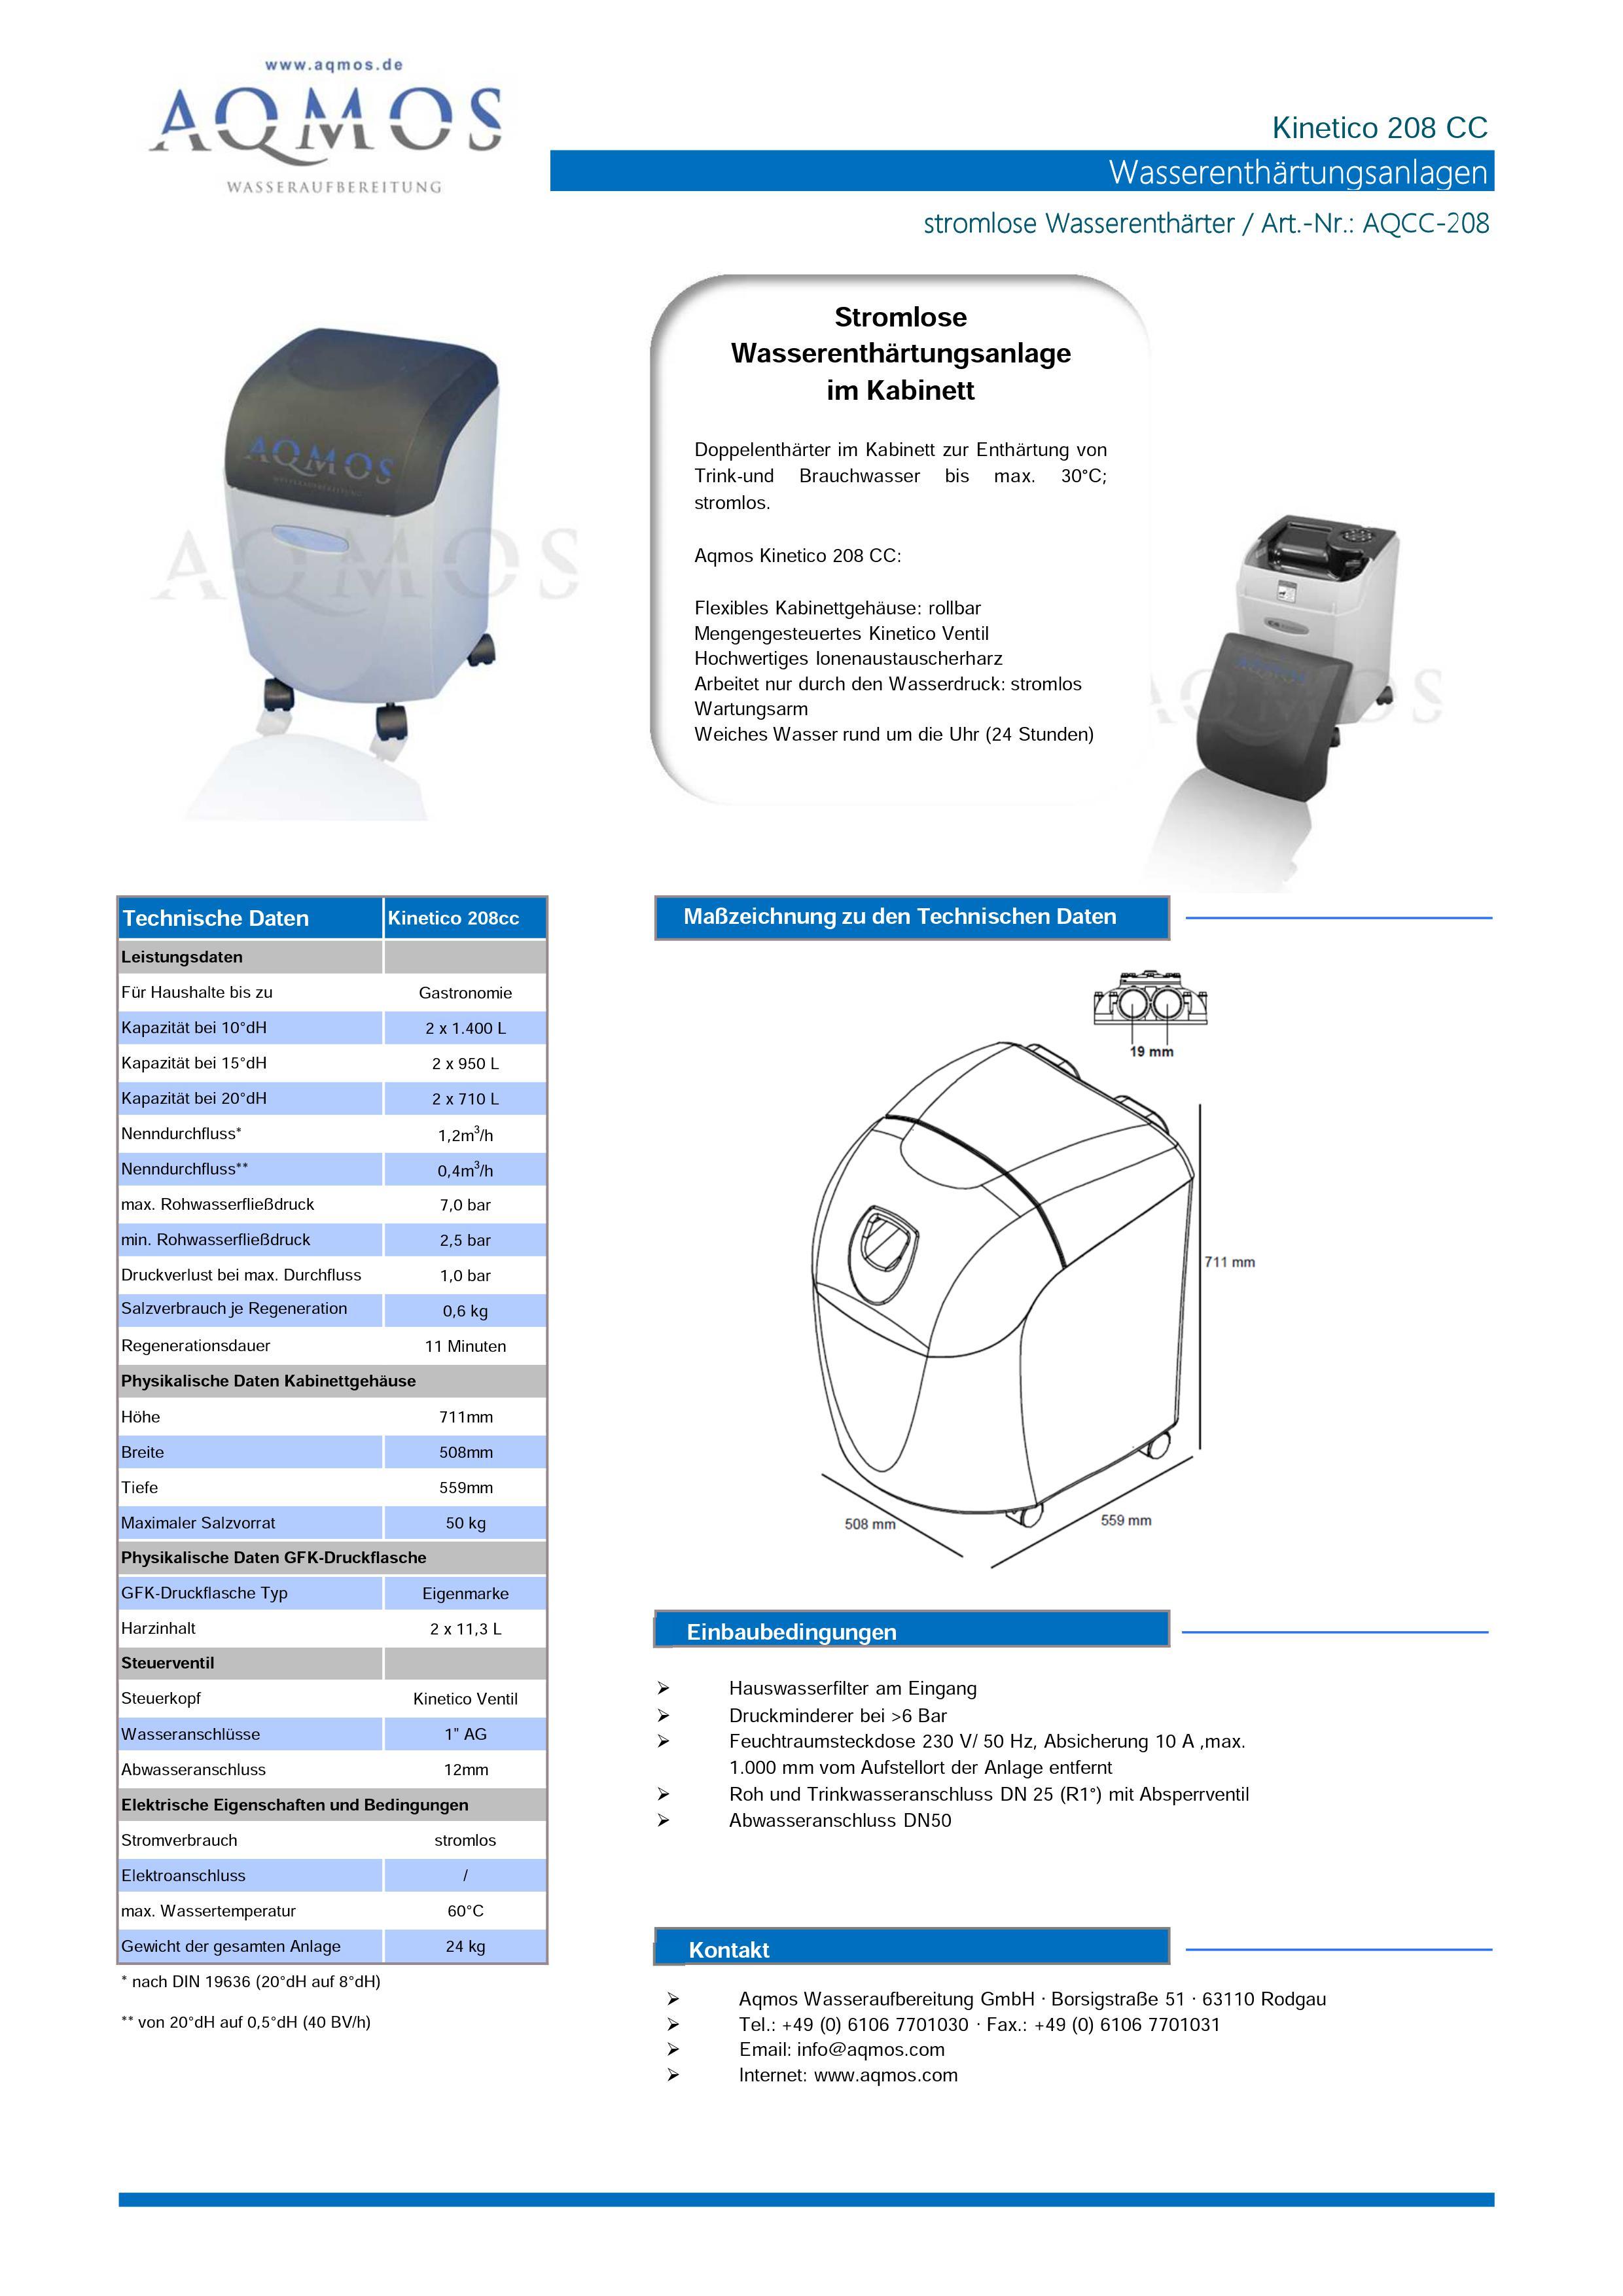 Kinetico-208-CC-Datenblatt